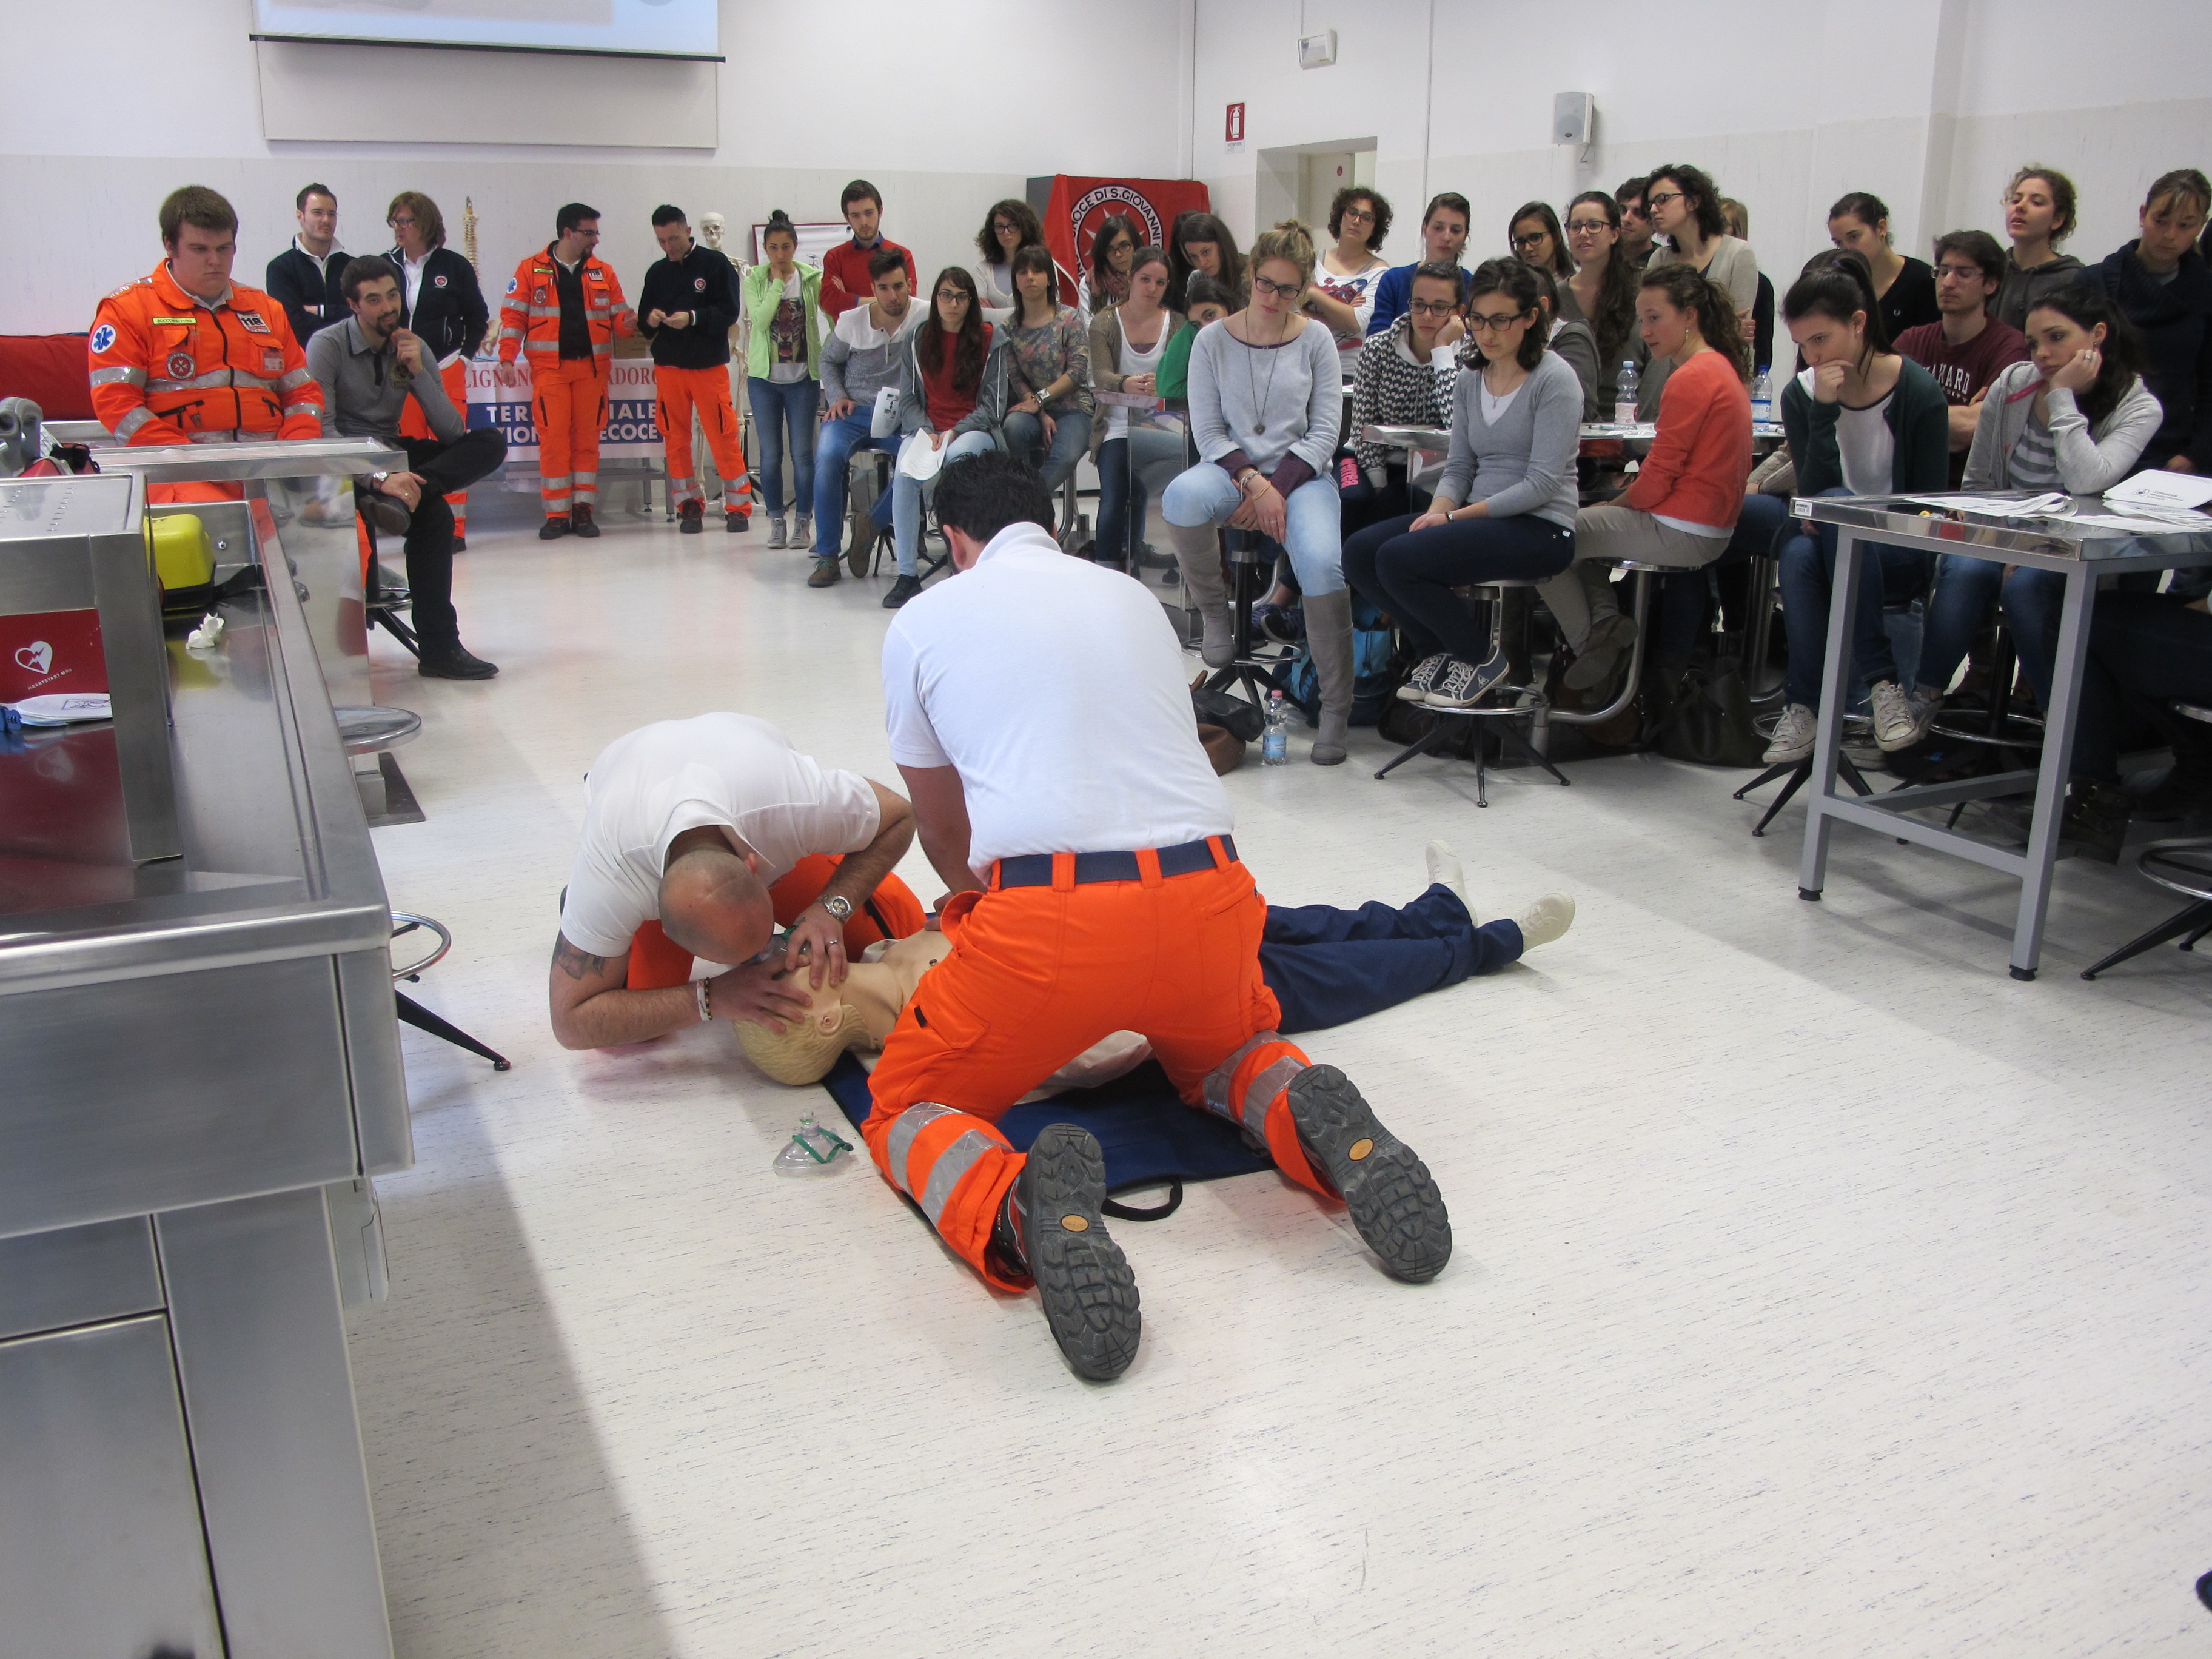 daverio 21enne in arresto cardiaco salvato dai carabinieri